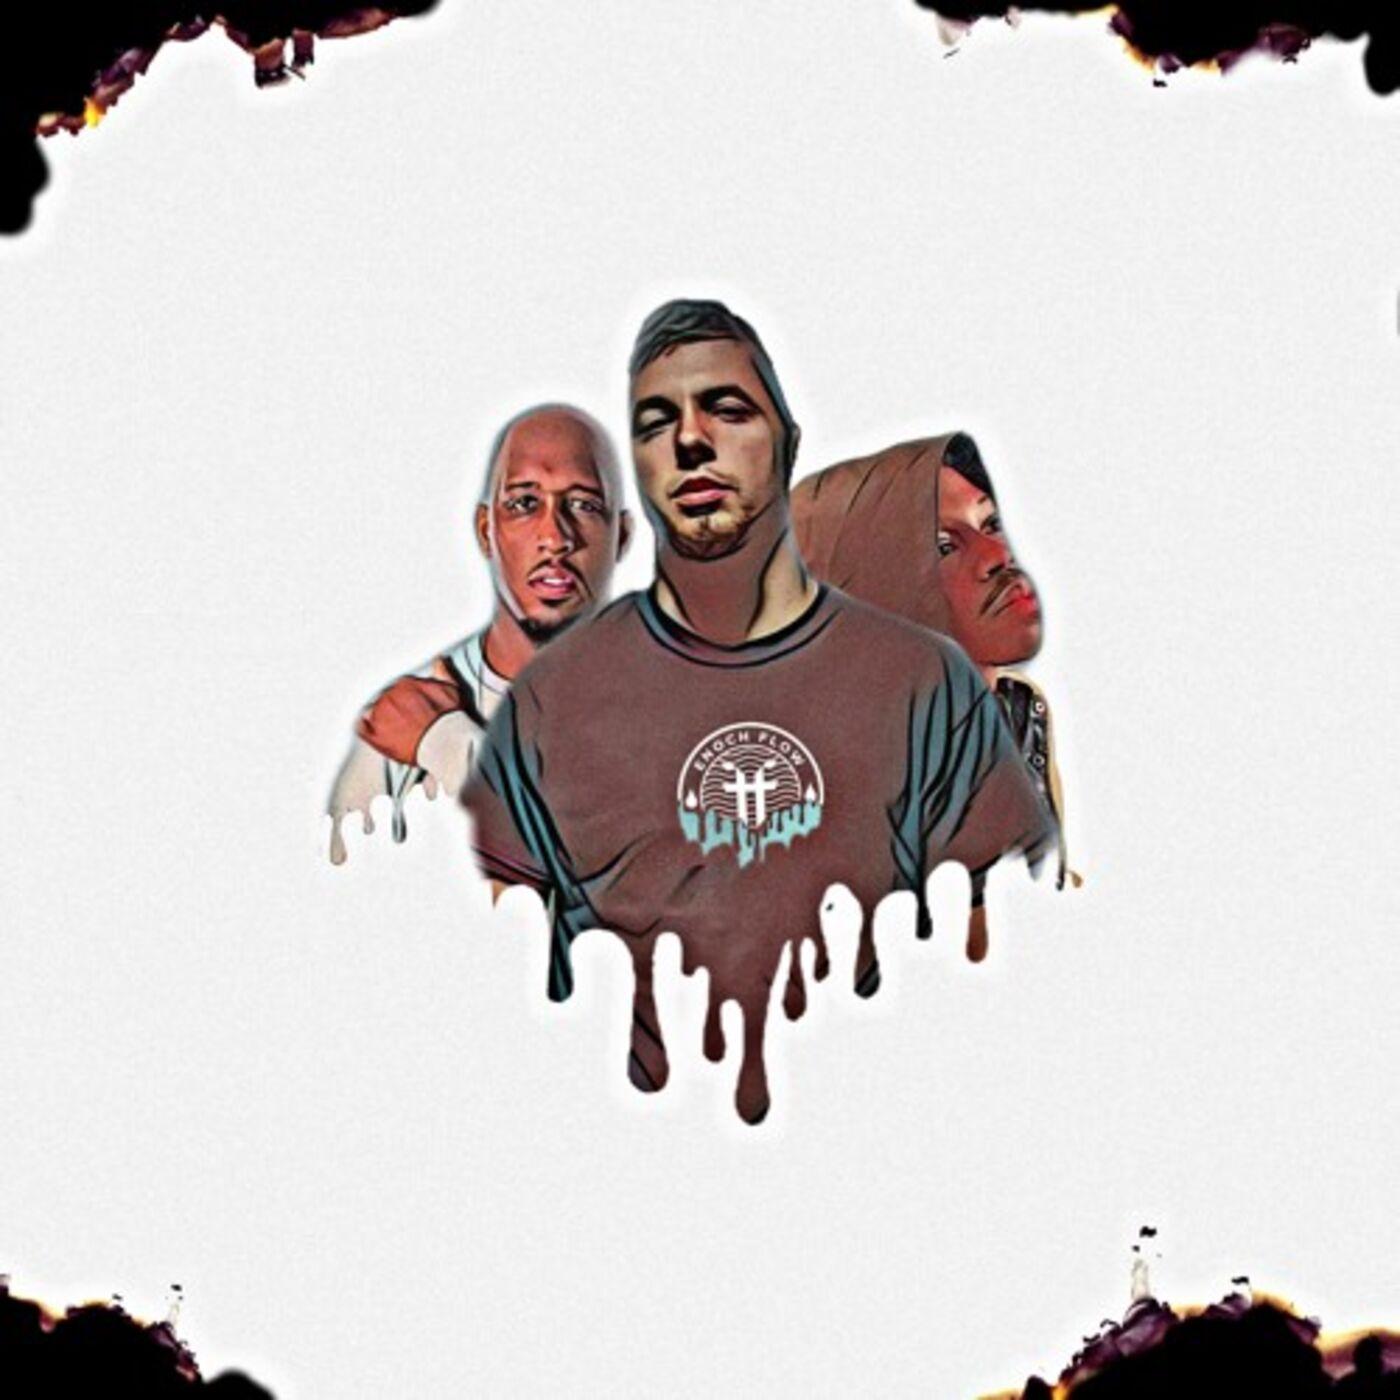 Lifted - J-Phish (ft). Derek Minor & YJO